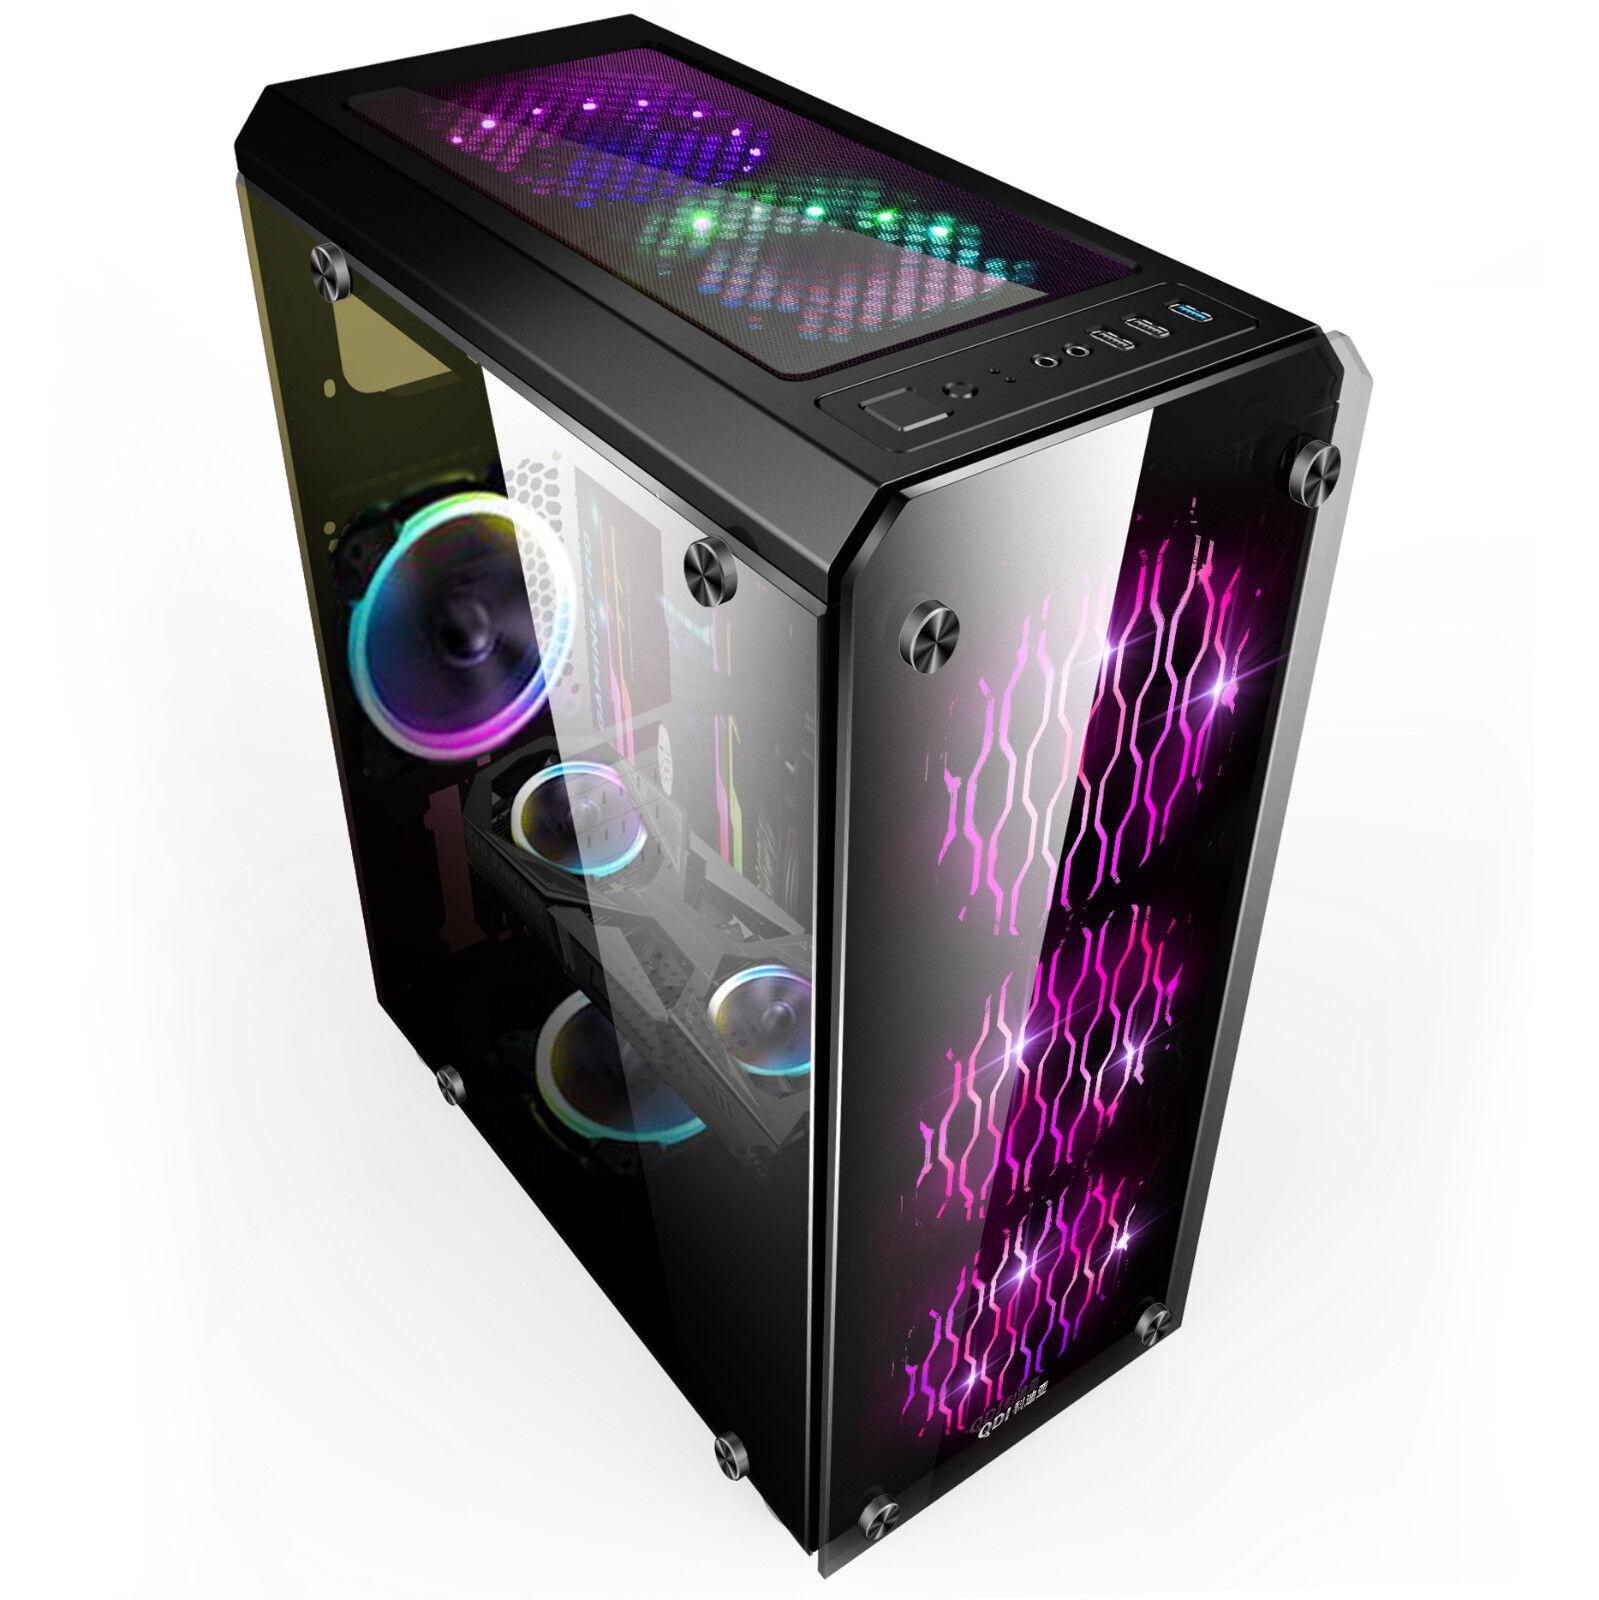 Glas  Pc Gehäuse USB 3.0 ATX ,Micro-ATX,Mini-ITX  Midi-Tower OVP schwarz YHJD--s